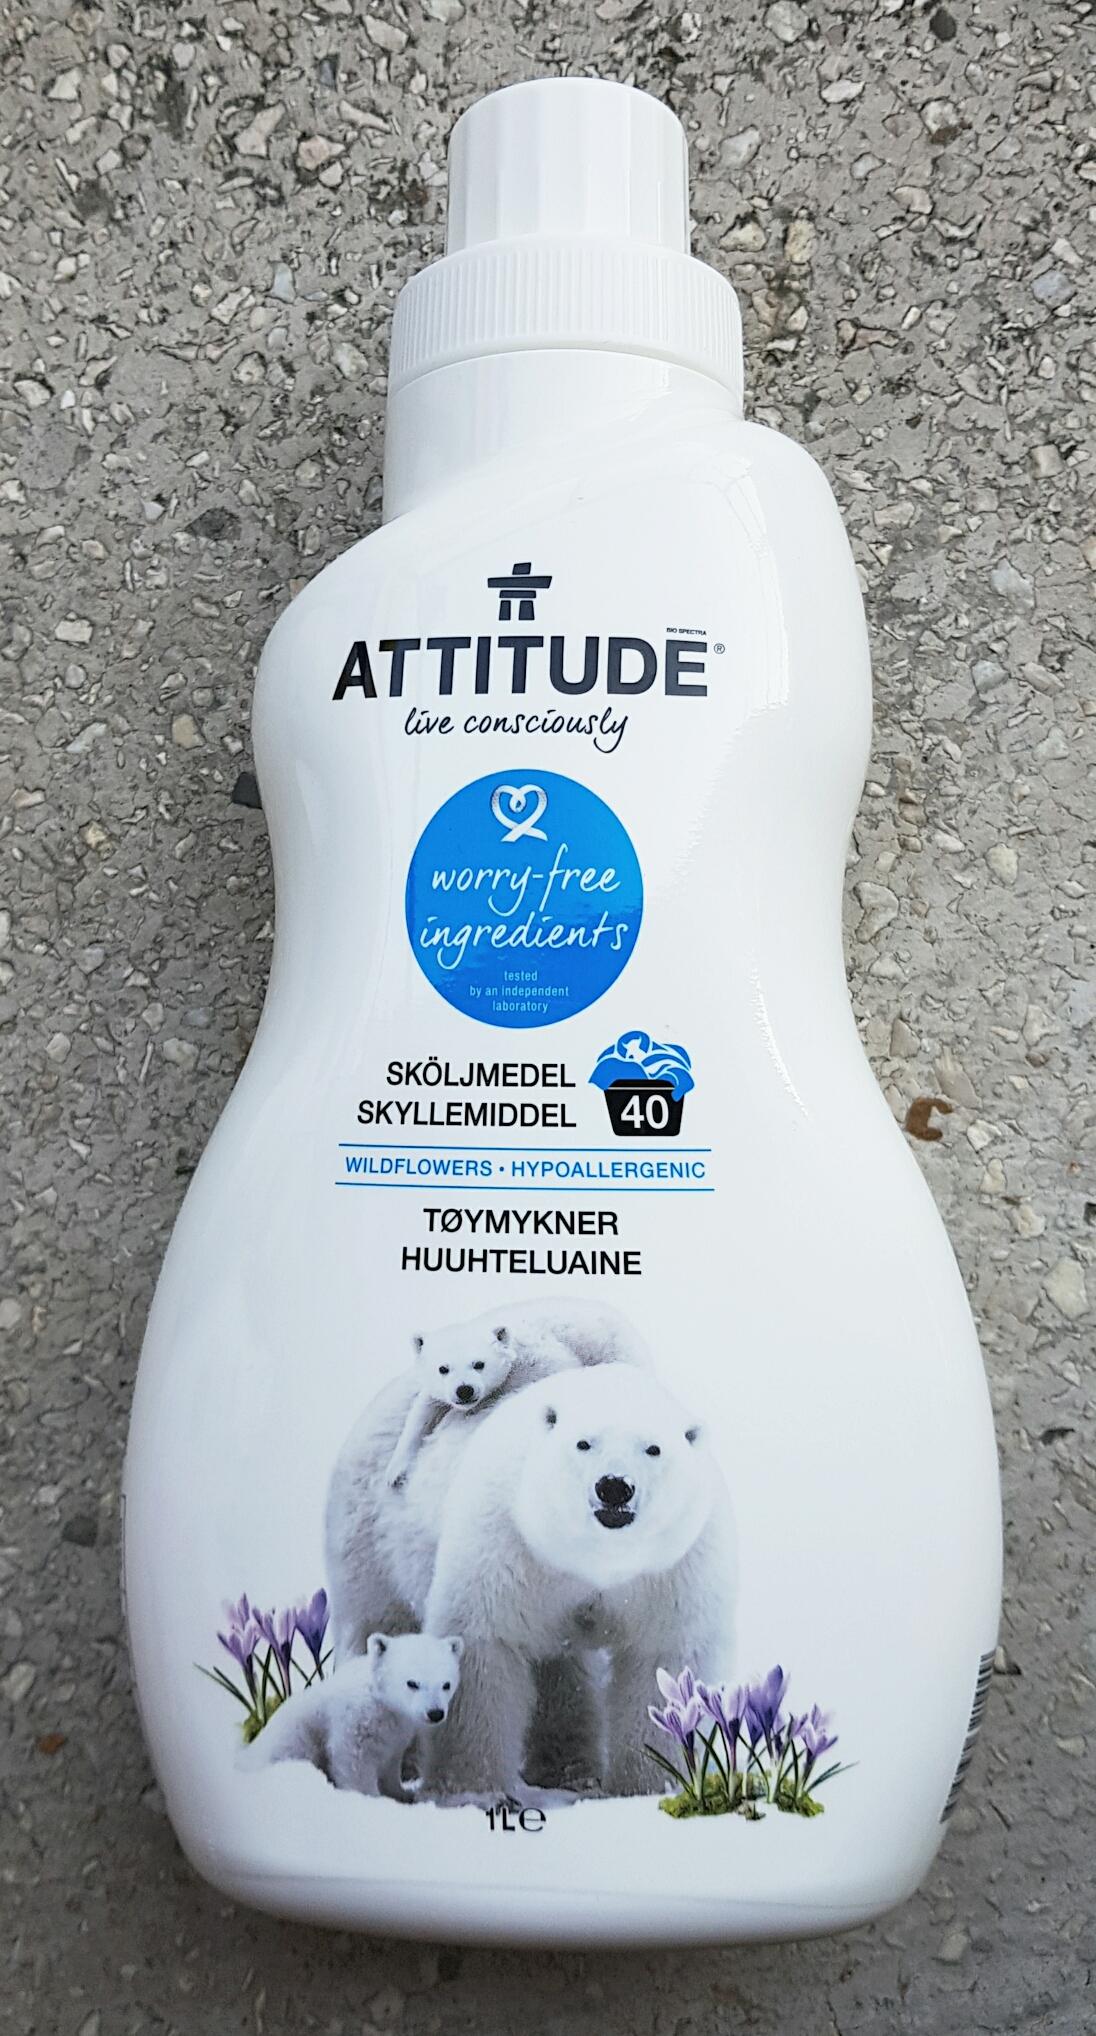 Balsam de rufe Attitude - flori de câmp Attitude vegan Cruelty-free ecologo